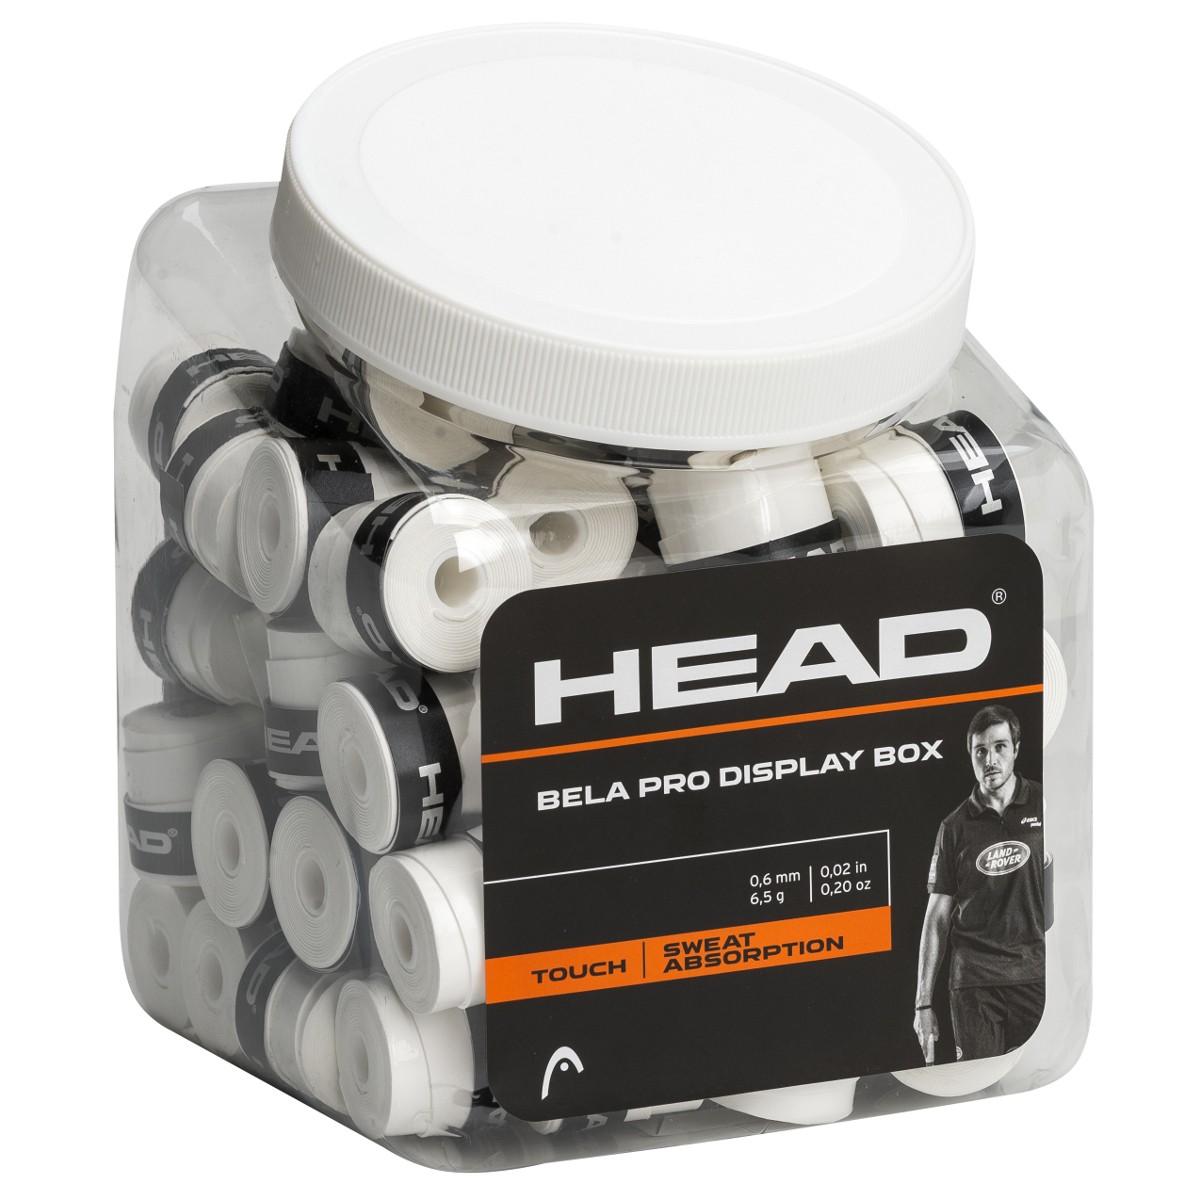 BOITE DE 70 SURGRIPS HEAD BELA DISPLAY